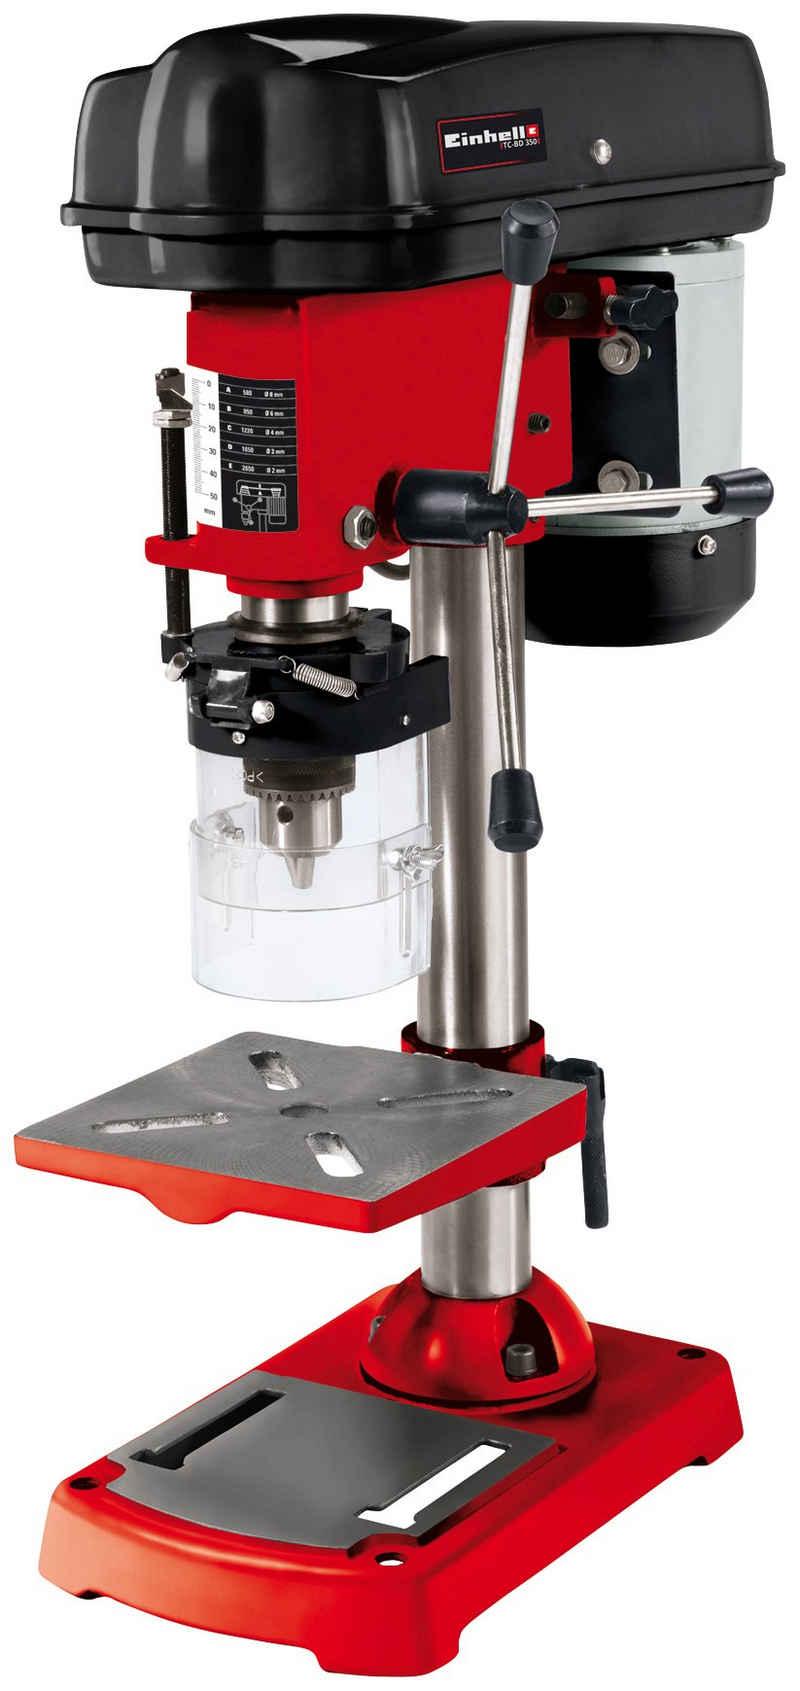 Einhell Säulenbohrmaschine »TC-BD 350«, 230 V, max. 2650 U/min